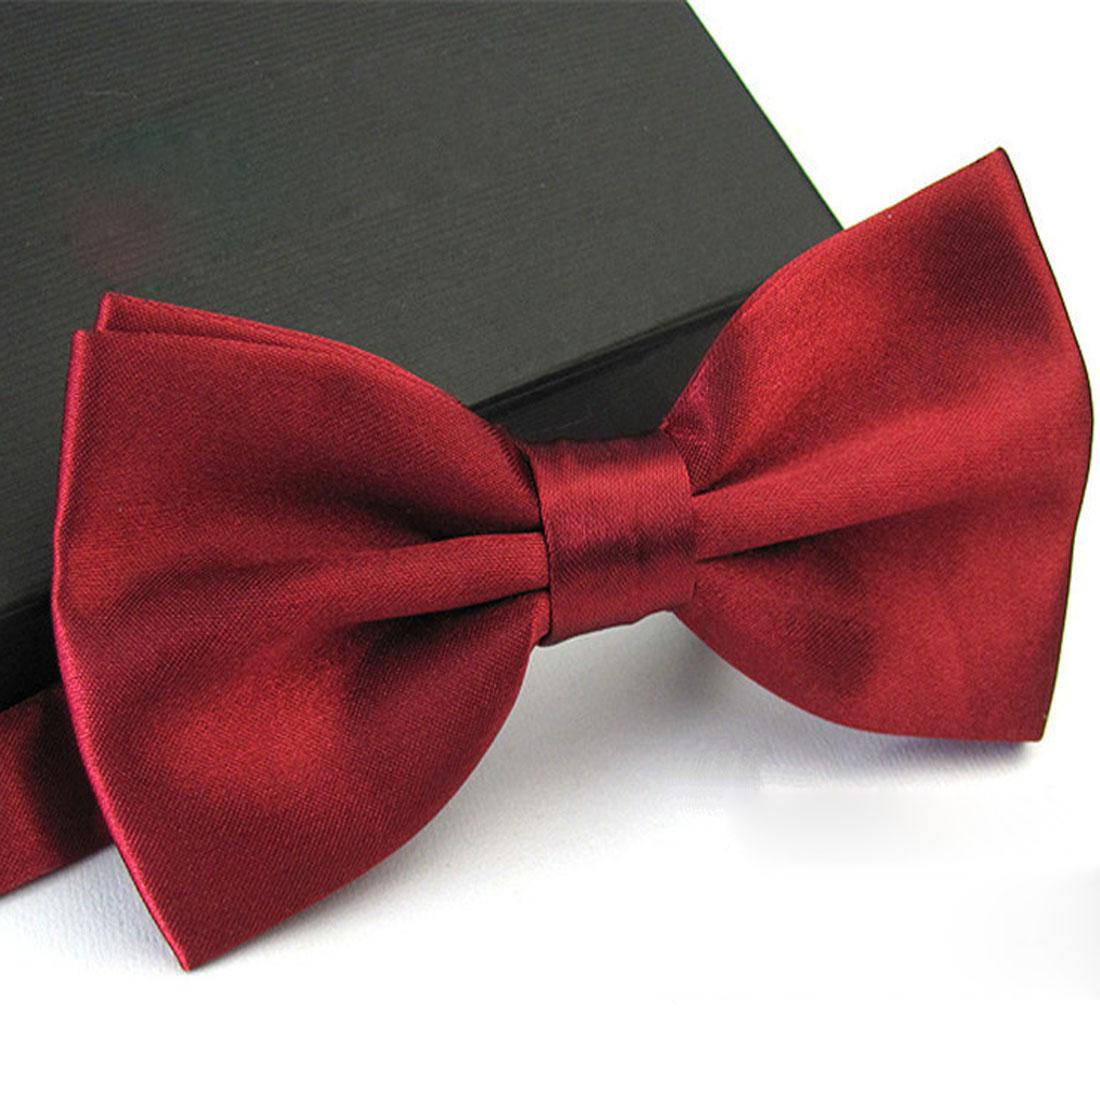 Bowtie Men Formal Necktie Boy Men's Fashion Business Wedding Bow Tie Male Dress Shirt Ties For Men Butterfly Ties For Men Hot